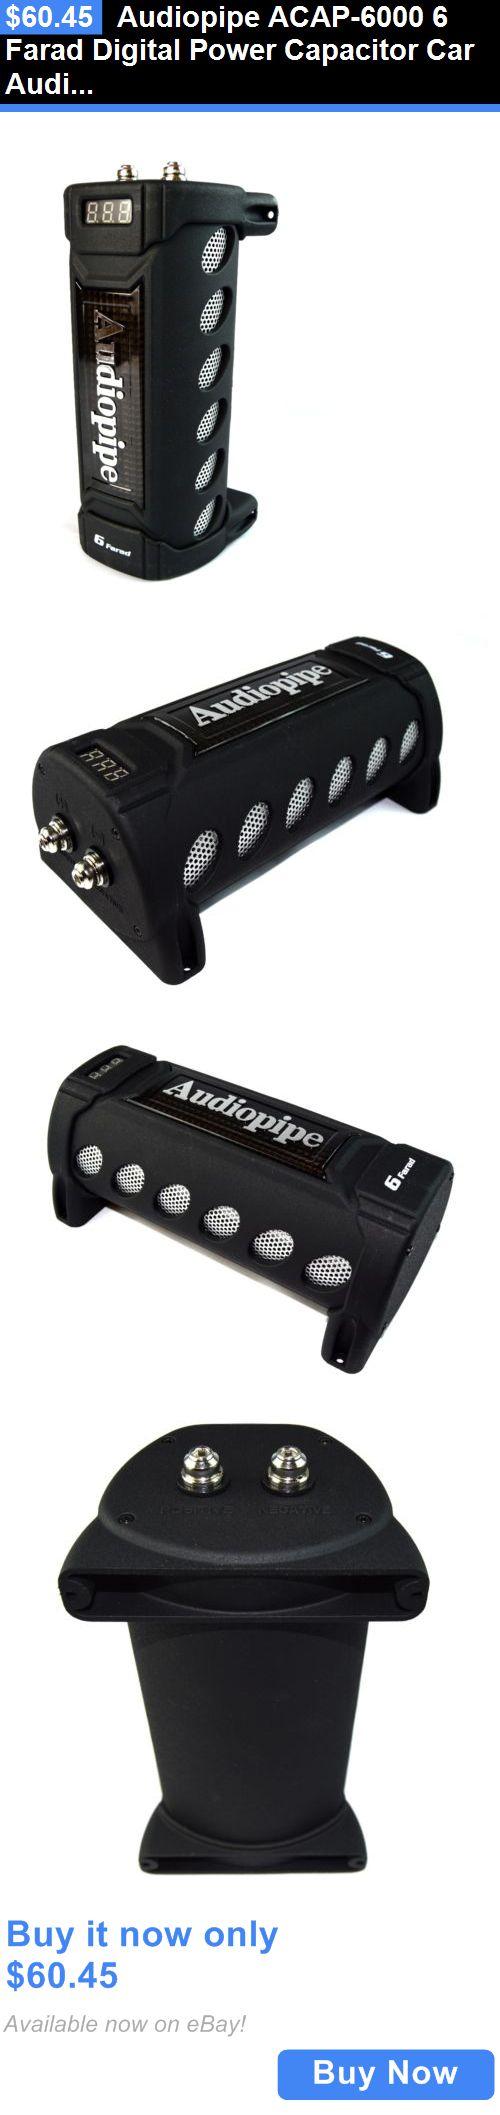 Capacitors: Audiopipe Acap-6000 6 Farad Digital Power Capacitor Car Audio Amplifier Cap BUY IT NOW ONLY: $60.45